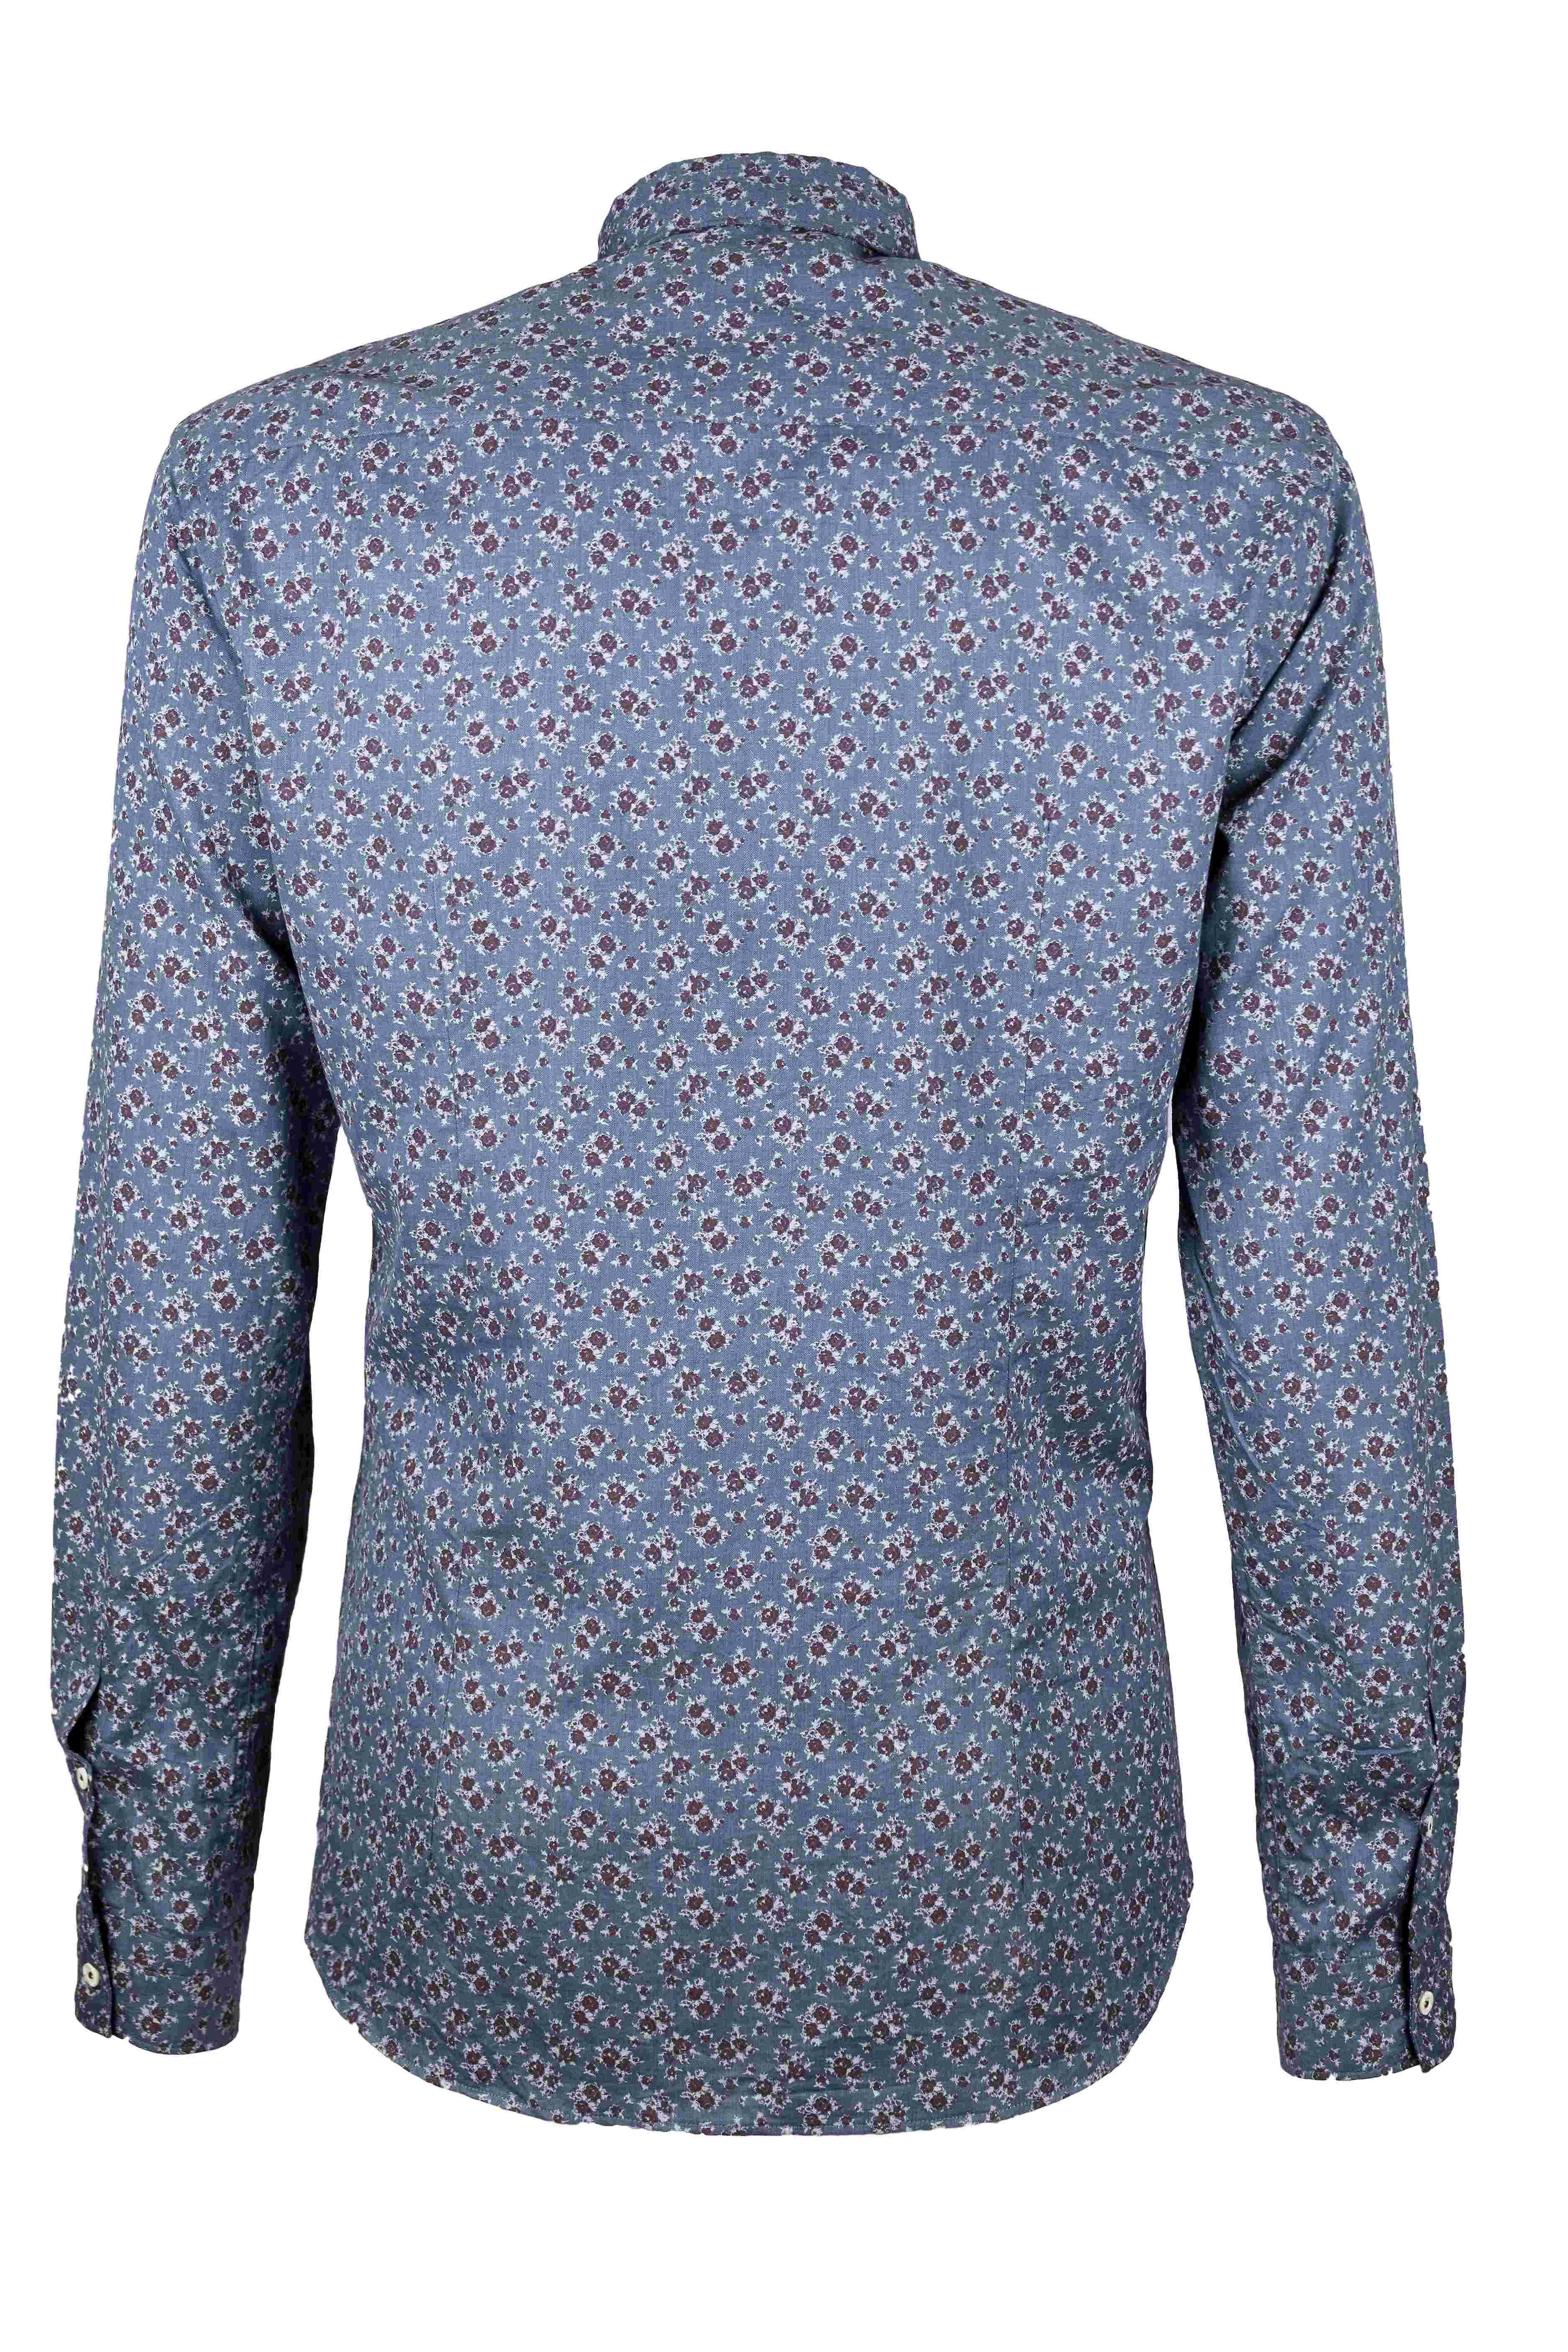 Fabio Giovanni La Serra Shirt - Mens Italian Casual Stylish Floral Shirt 100% Cotton - Long Sleeve